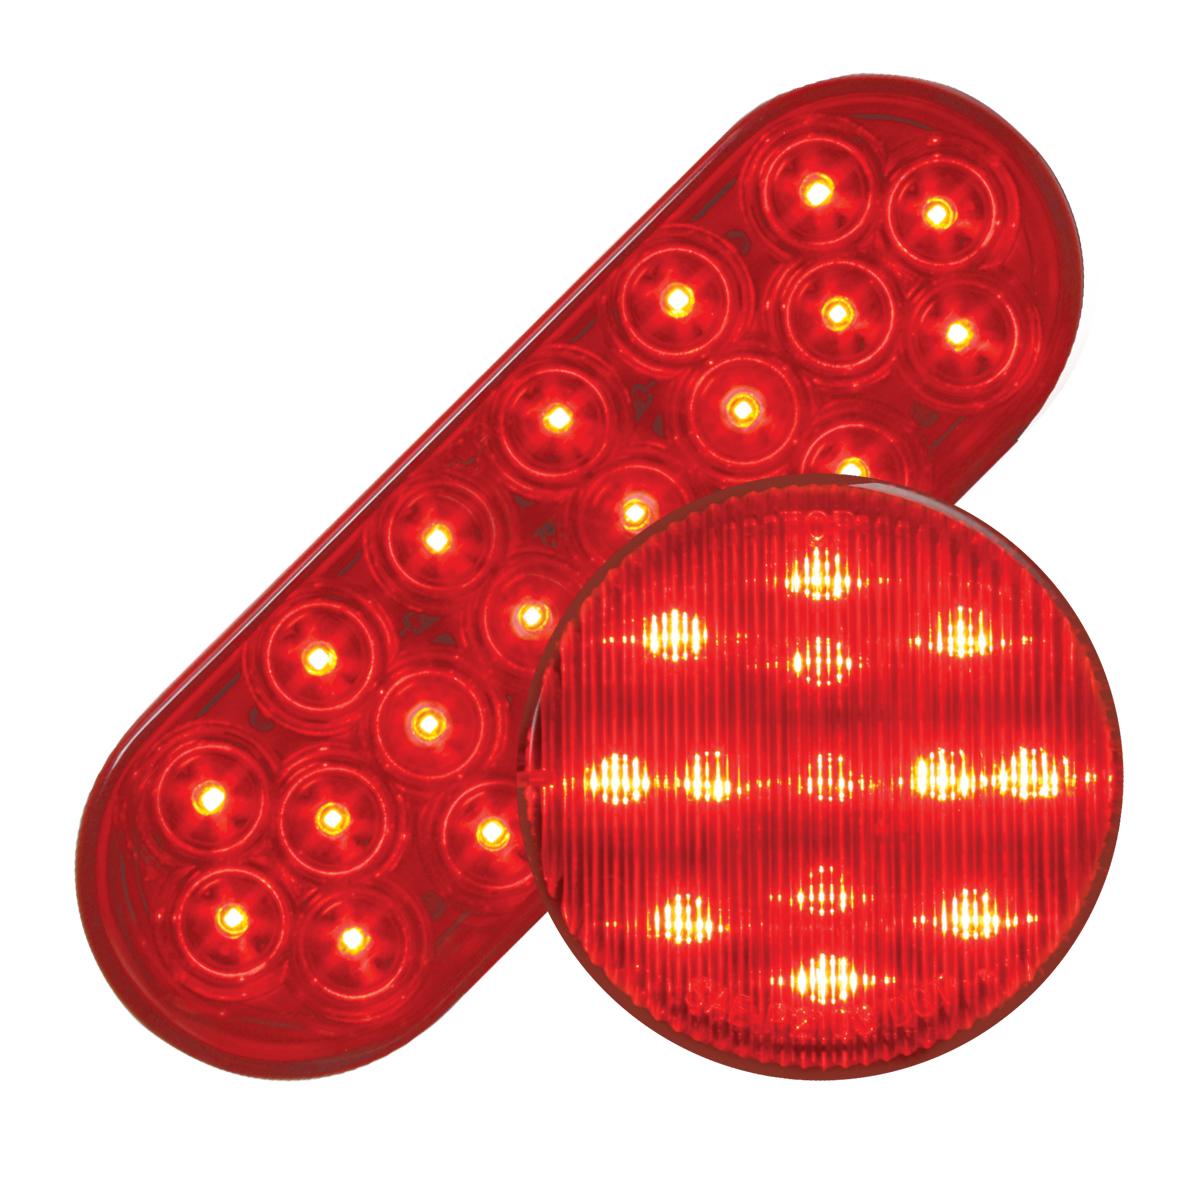 #87721/#79311 Fleet LED Red/Red - Flat